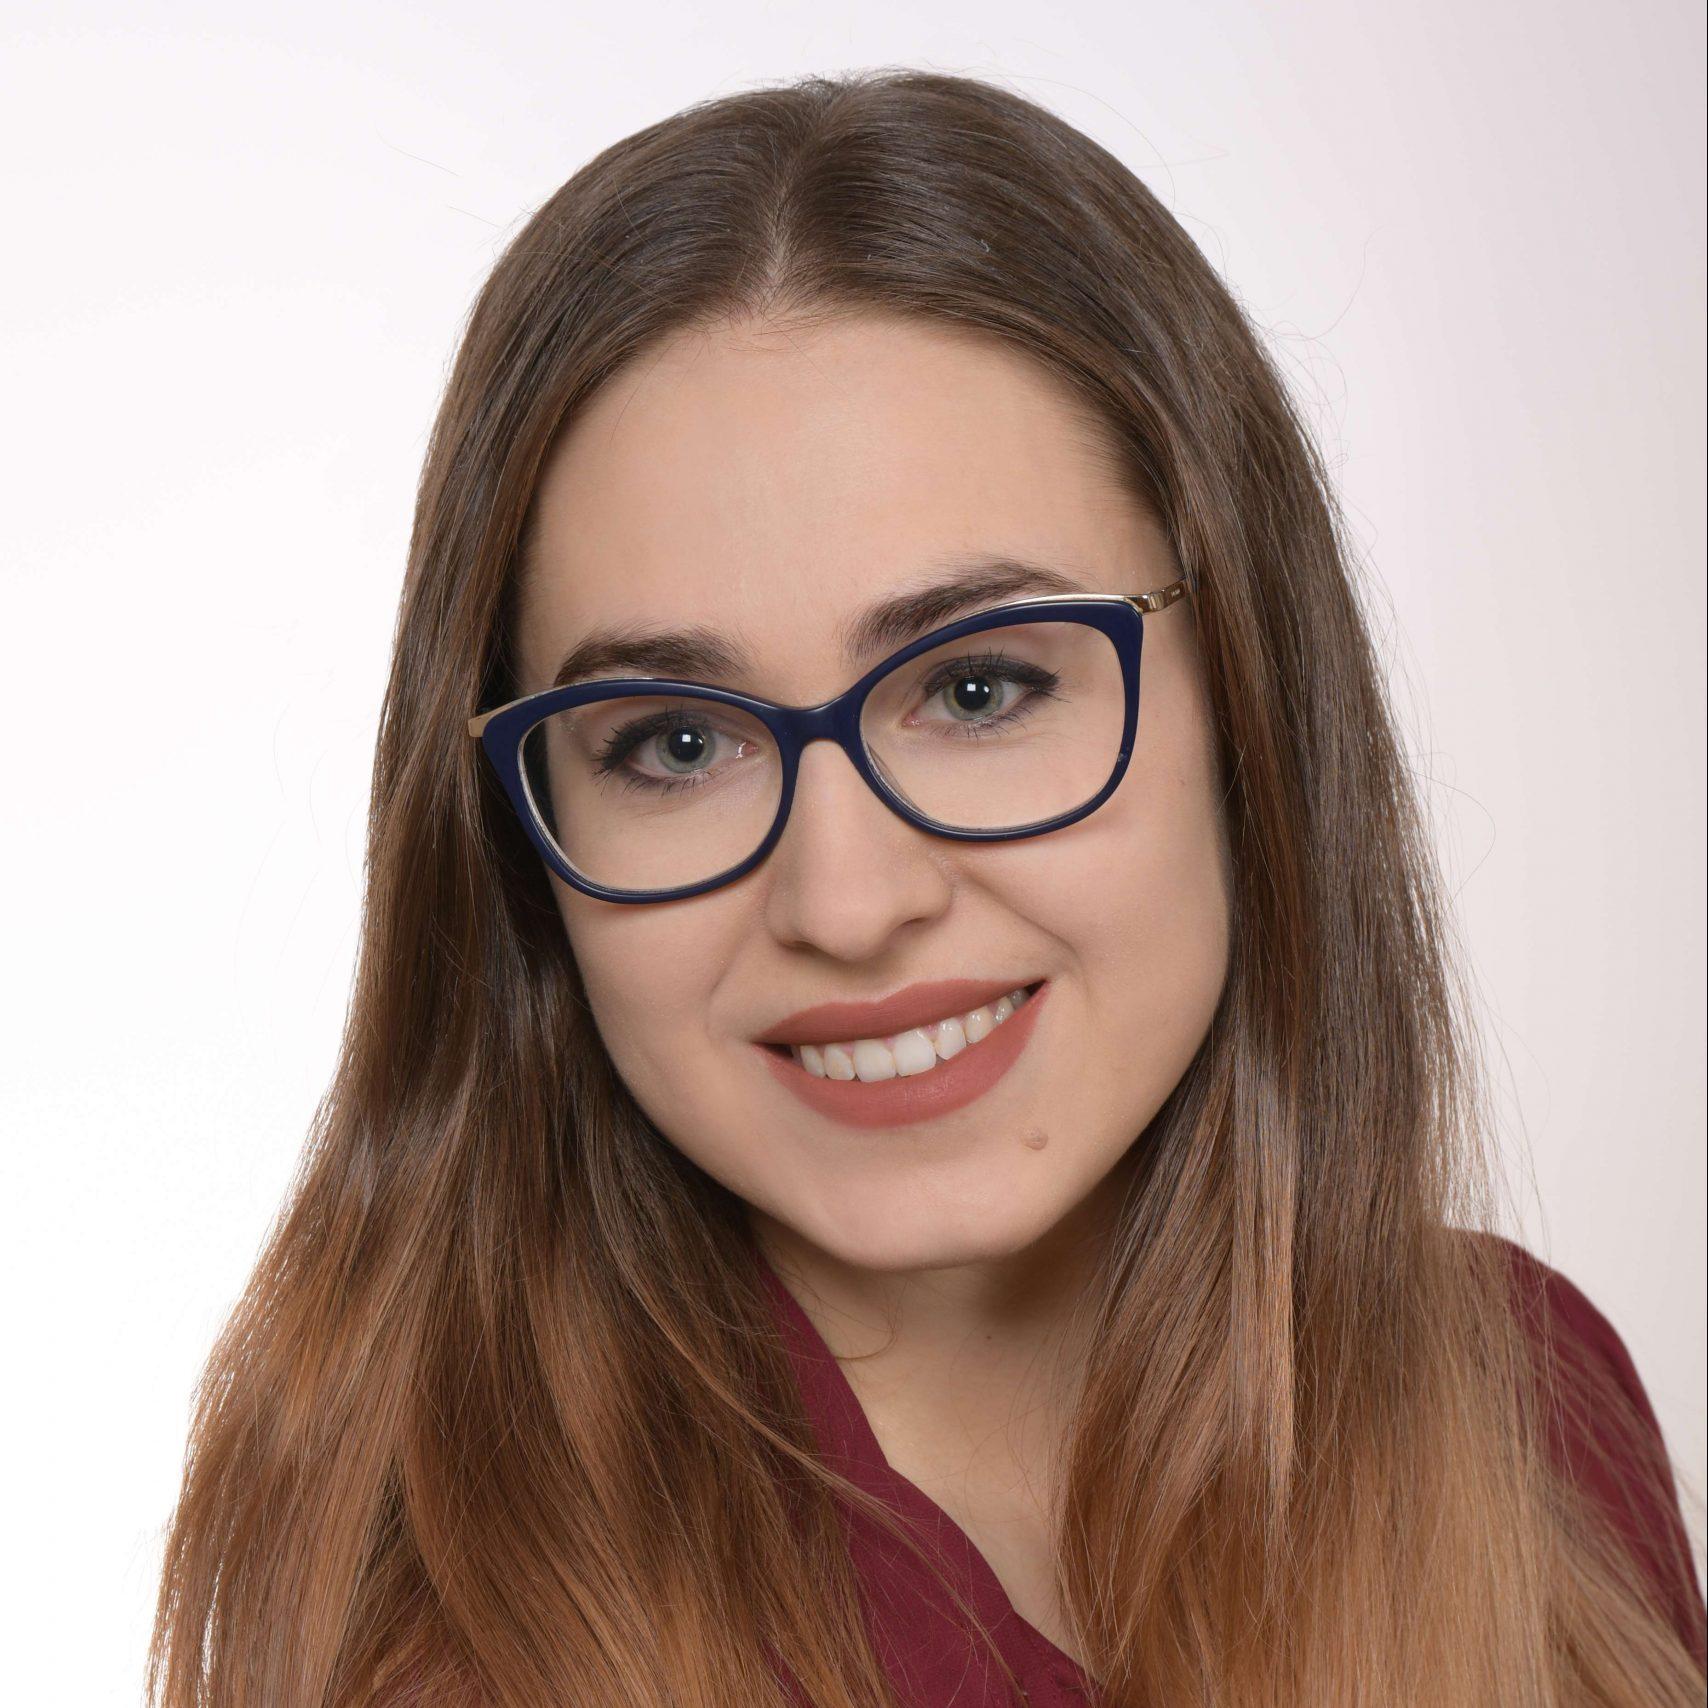 Justyna Kryś